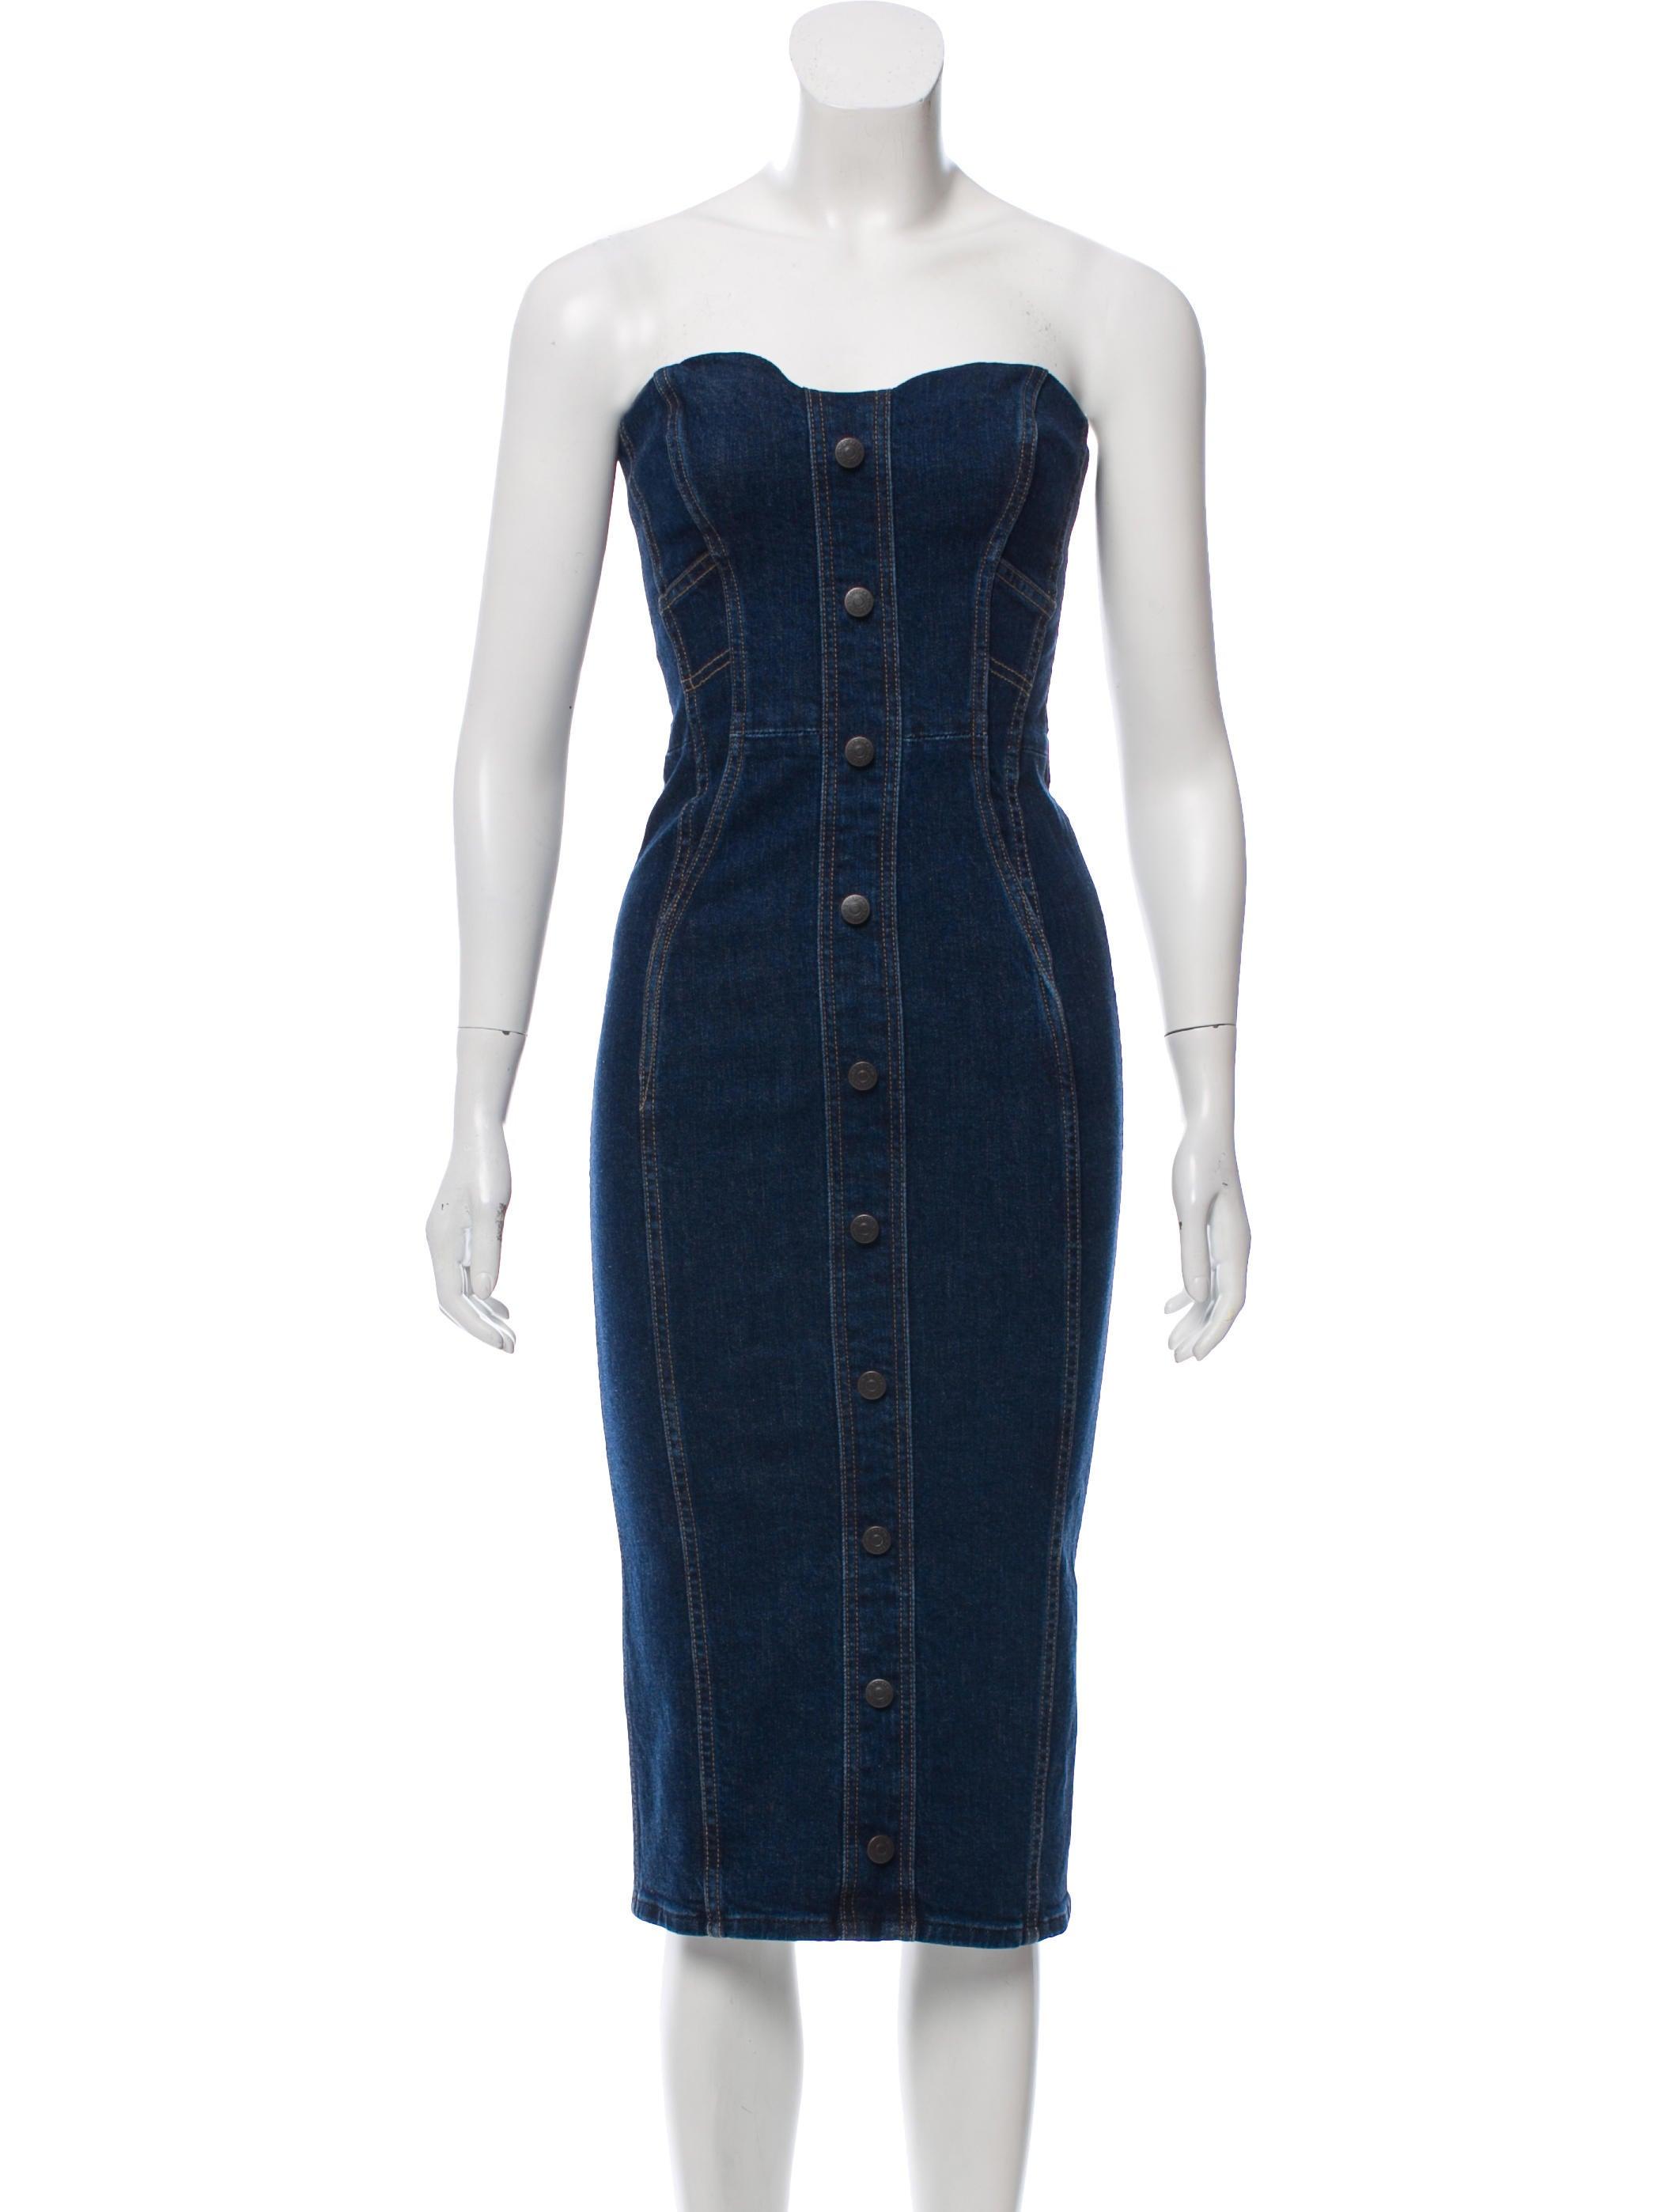 d55b803af5 Veronica Beard 2018 Liza Denim Dress - Clothing - WV130136